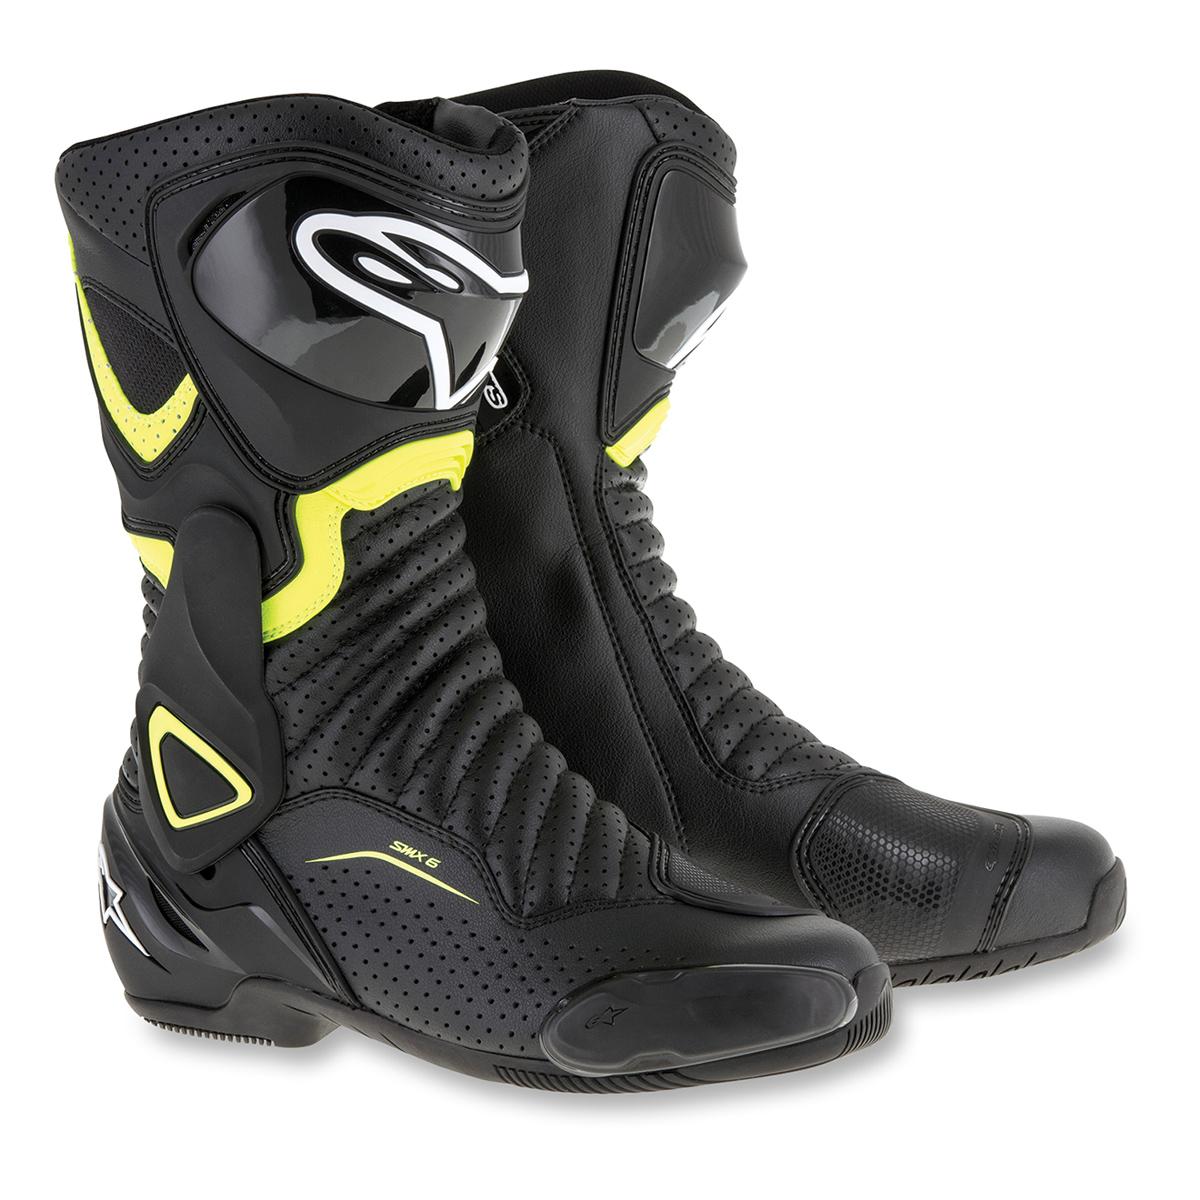 Alpinestars Men's SMX-6 v2 Vented Black/Yellow Boots